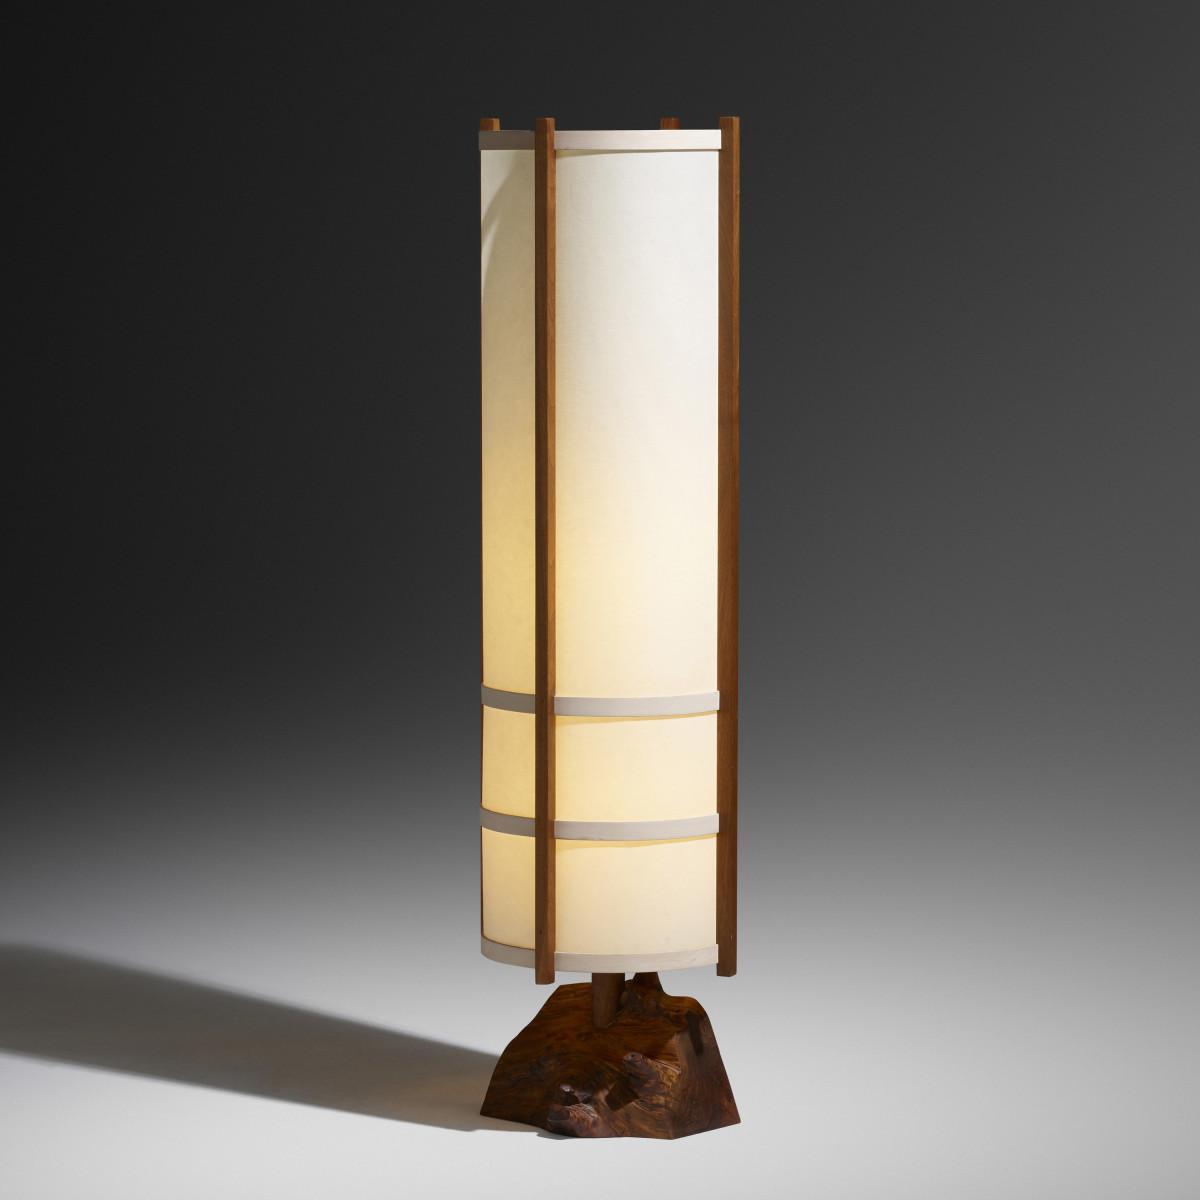 "George Nakashima Kent Hall floor lamp, Nakashima Studio, 1986, walnut burl, walnut, holly, fiberglass, 58-3/4"" h ×  16-1/6"" dia; $62,500."